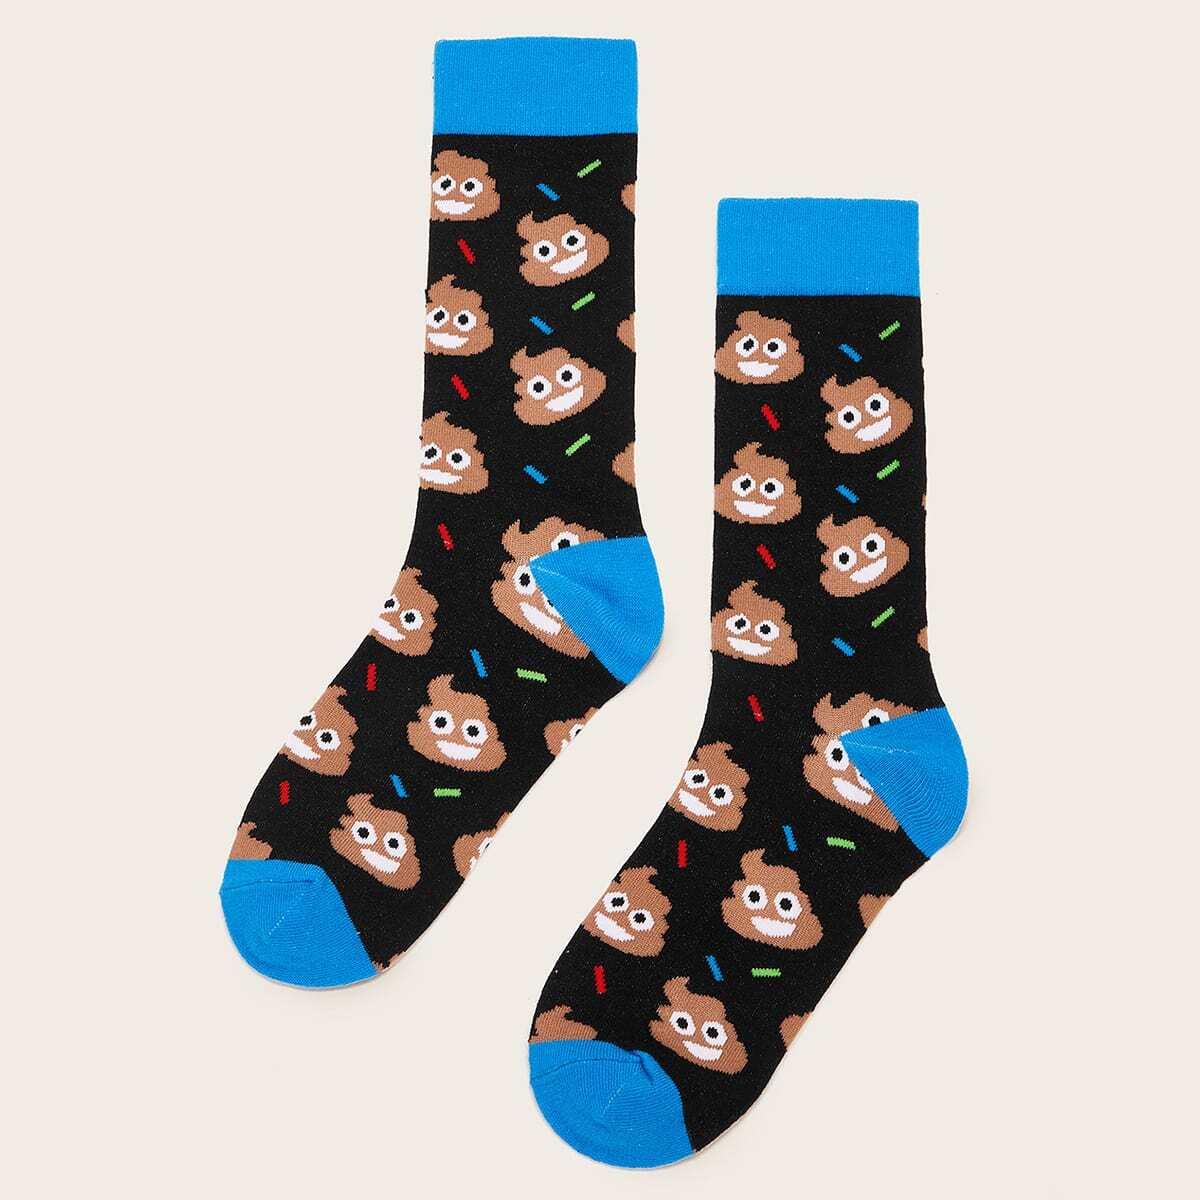 Men Cartoon Pattern Socks 1pair, SHEIN  - buy with discount